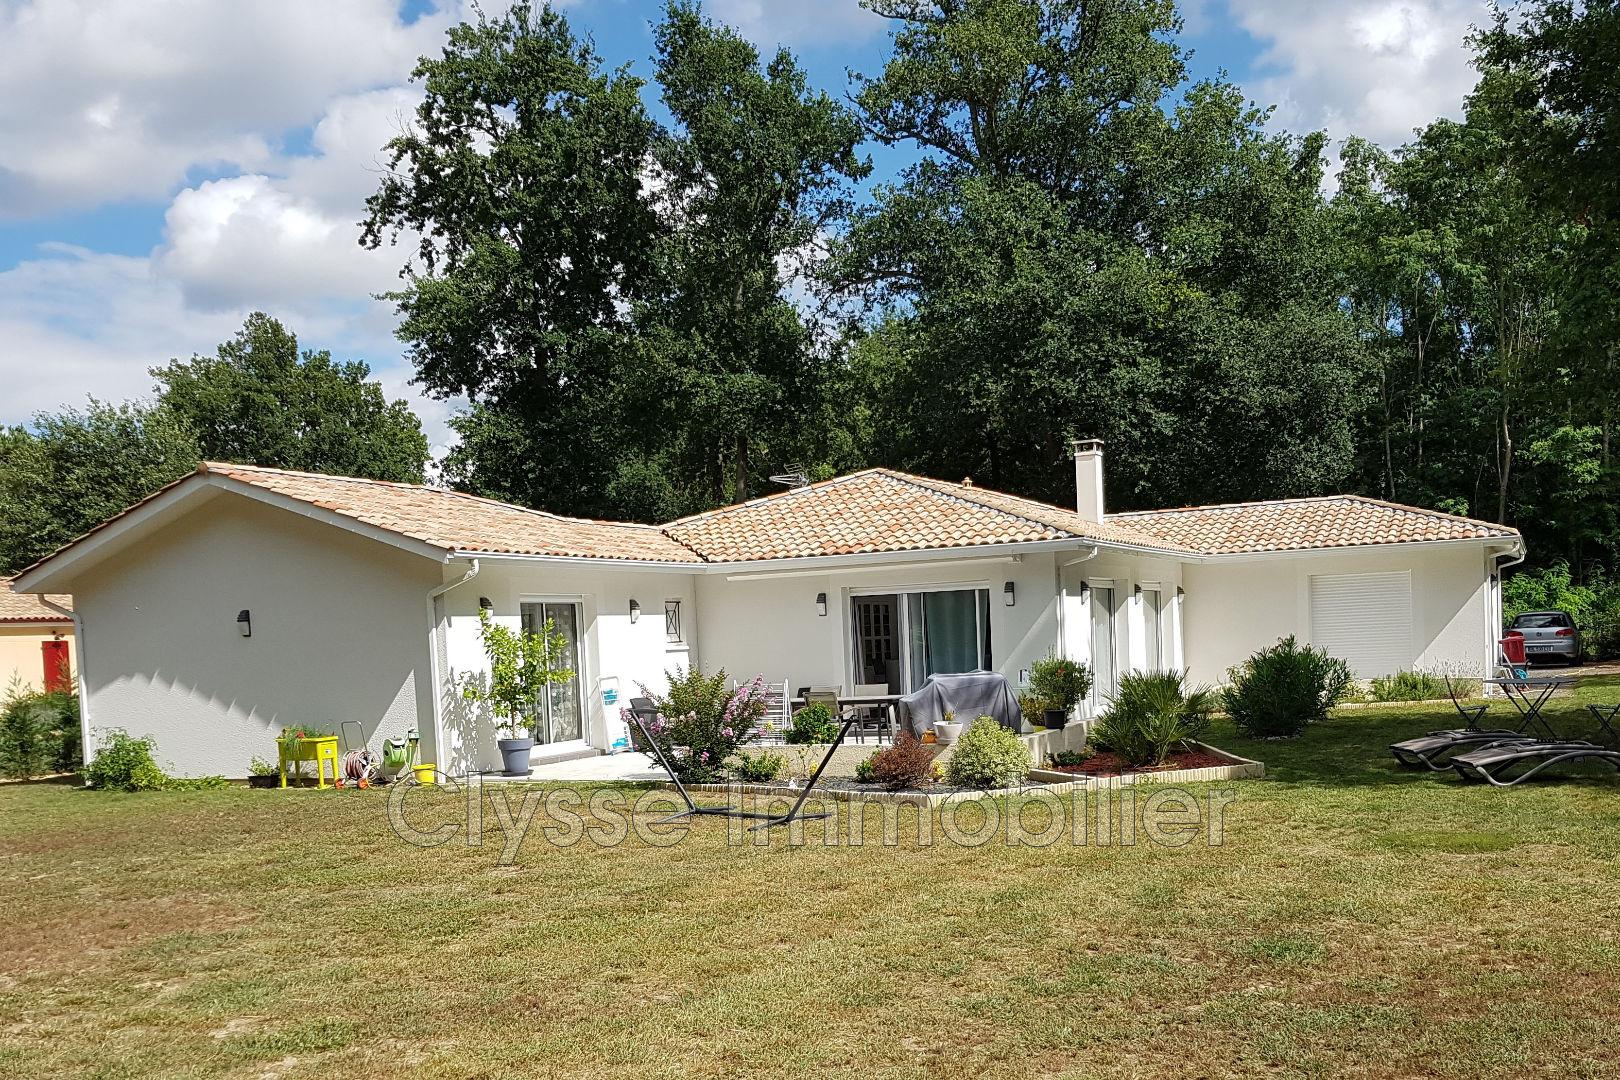 Maison Contemporaine Preignac Sud Gironde To Buy Maison